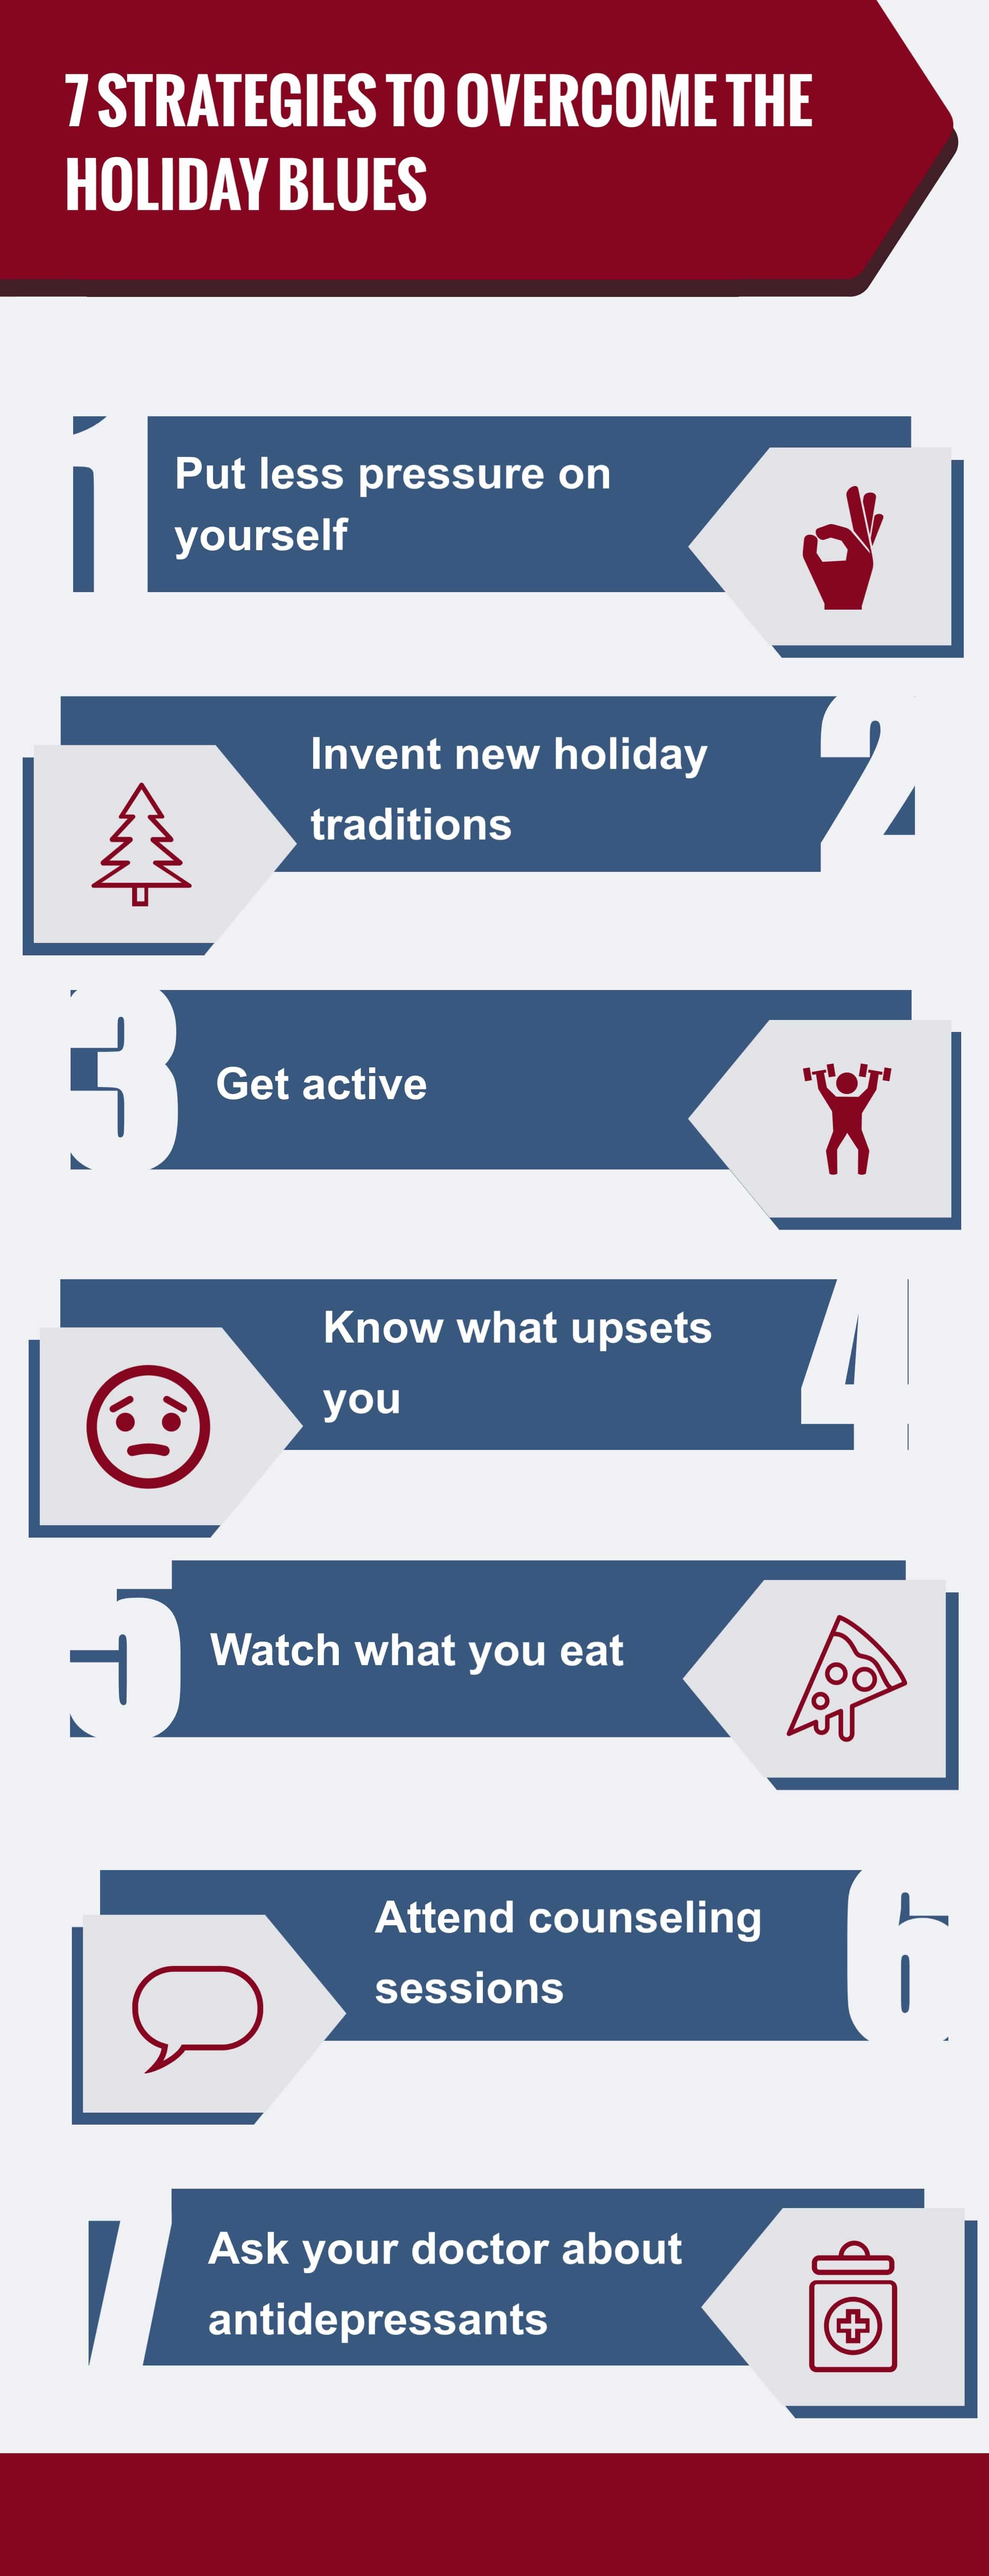 7 Strategies to Overcome the Holiday Blues, Pasadena Health Center, Pasadena, TX